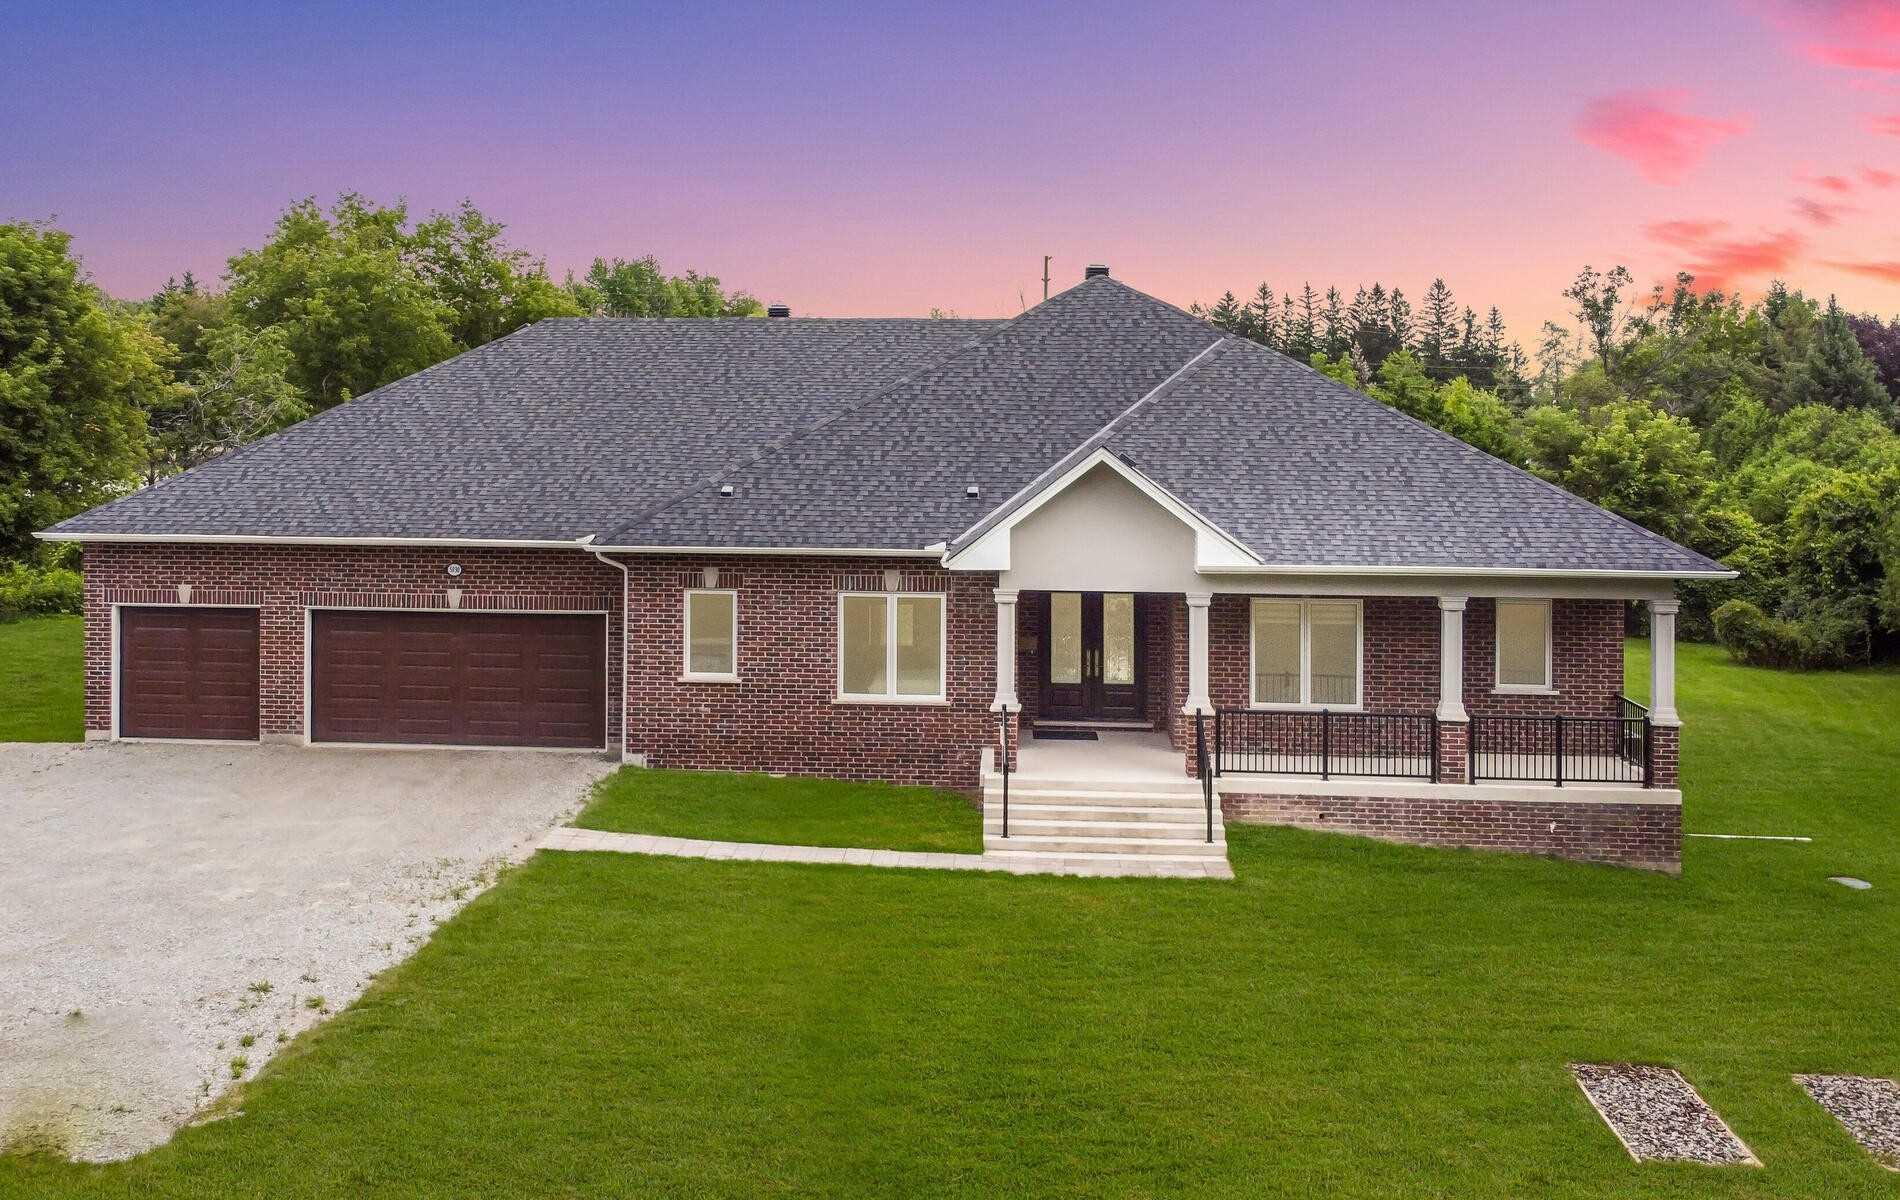 Detached house For Sale In Burlington - 5030 Guelph Line, Burlington, Ontario, Canada L7P 0V4 , 3 Bedrooms Bedrooms, ,4 BathroomsBathrooms,Detached,For Sale,Guelph Line